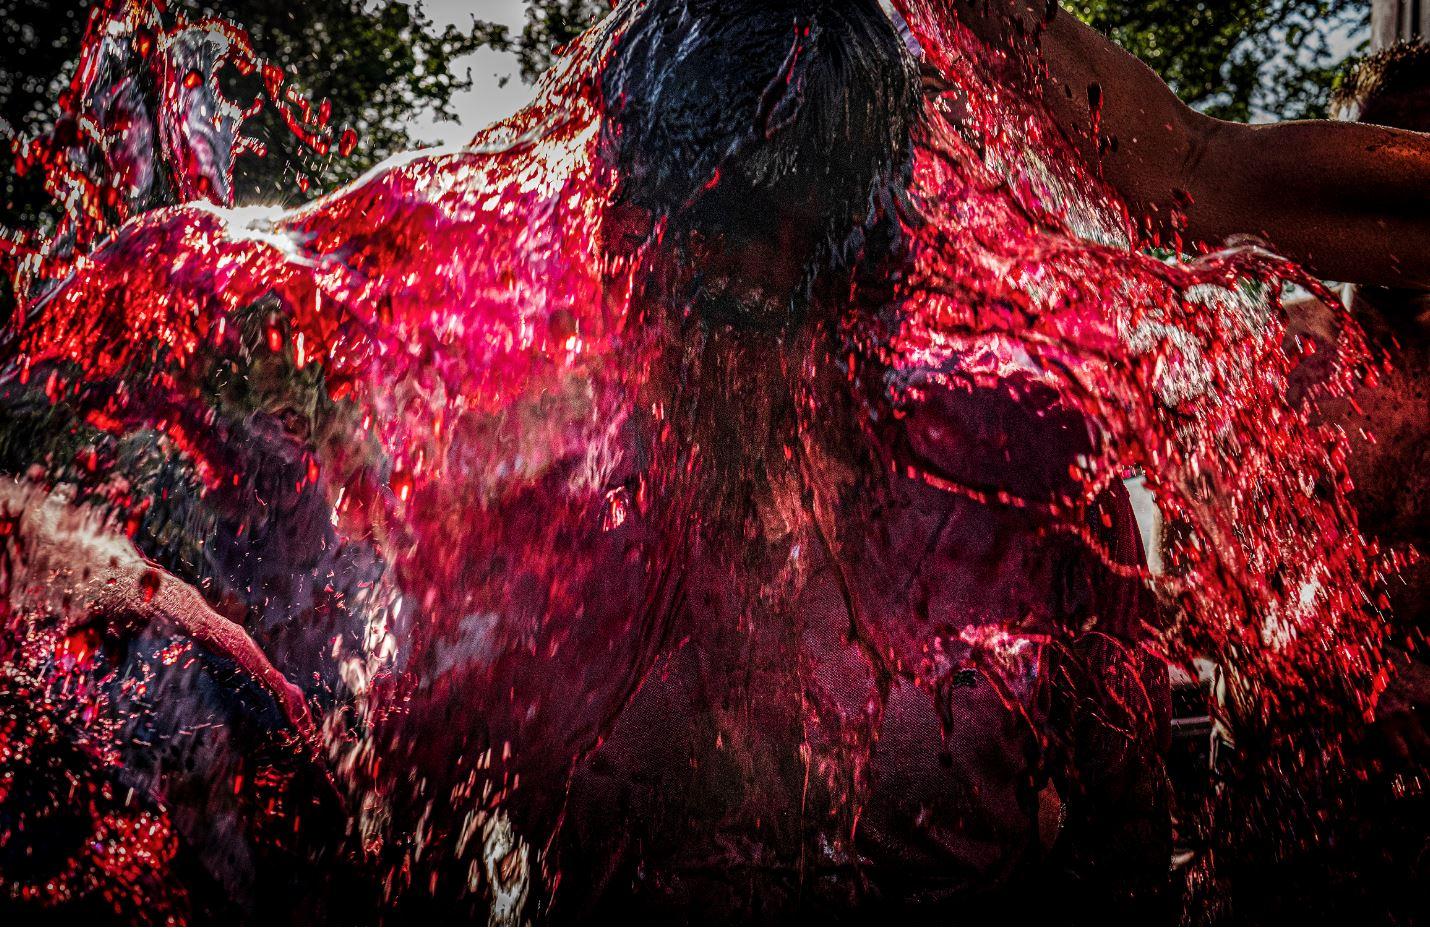 Primer premio concurso de fotografía La Rioja Capital